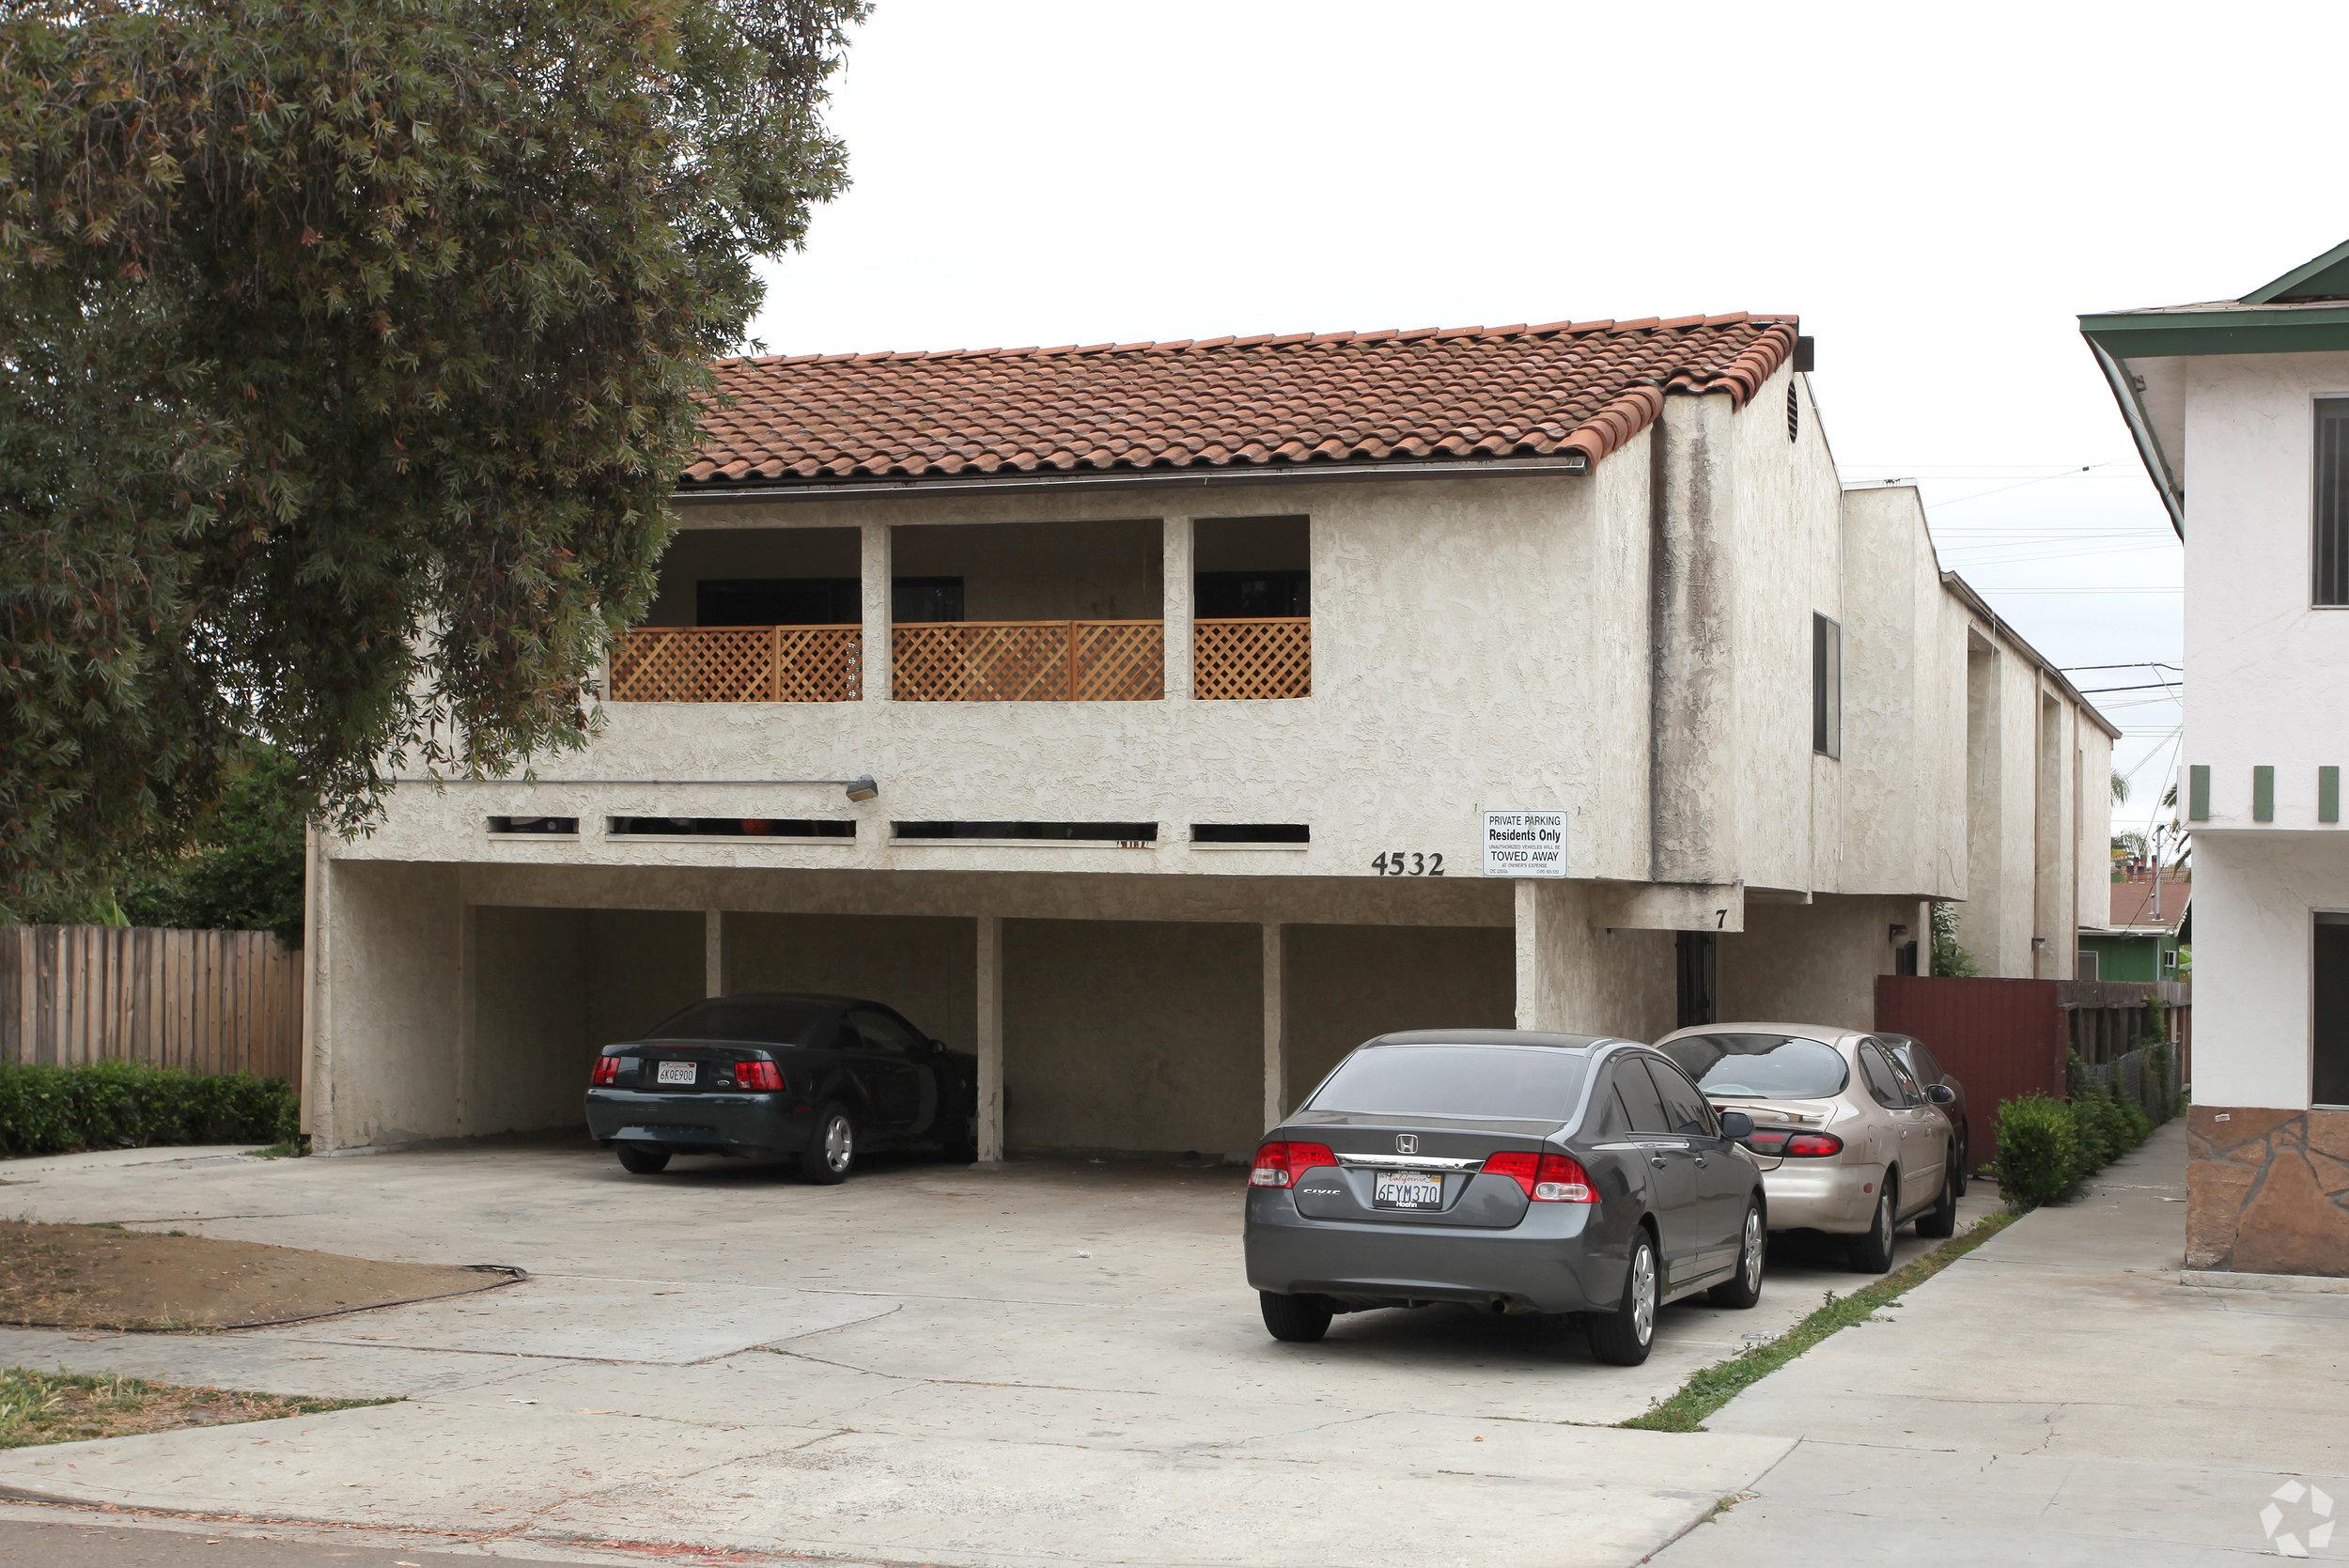 4532 Felton Street - Normal Heights7 Units$1,550,000